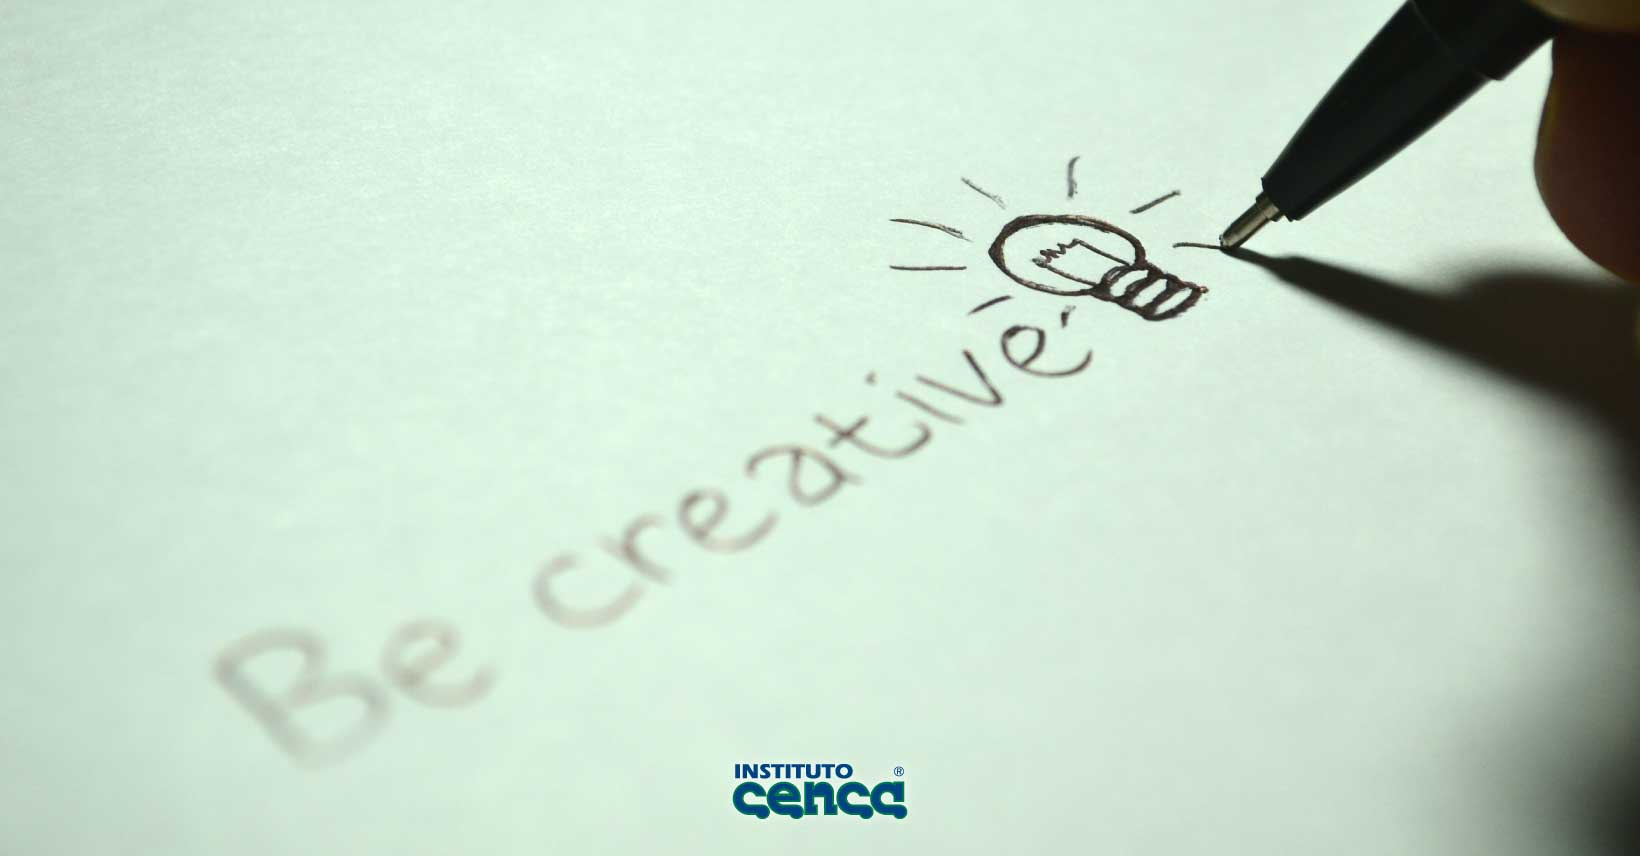 Creativity also changed